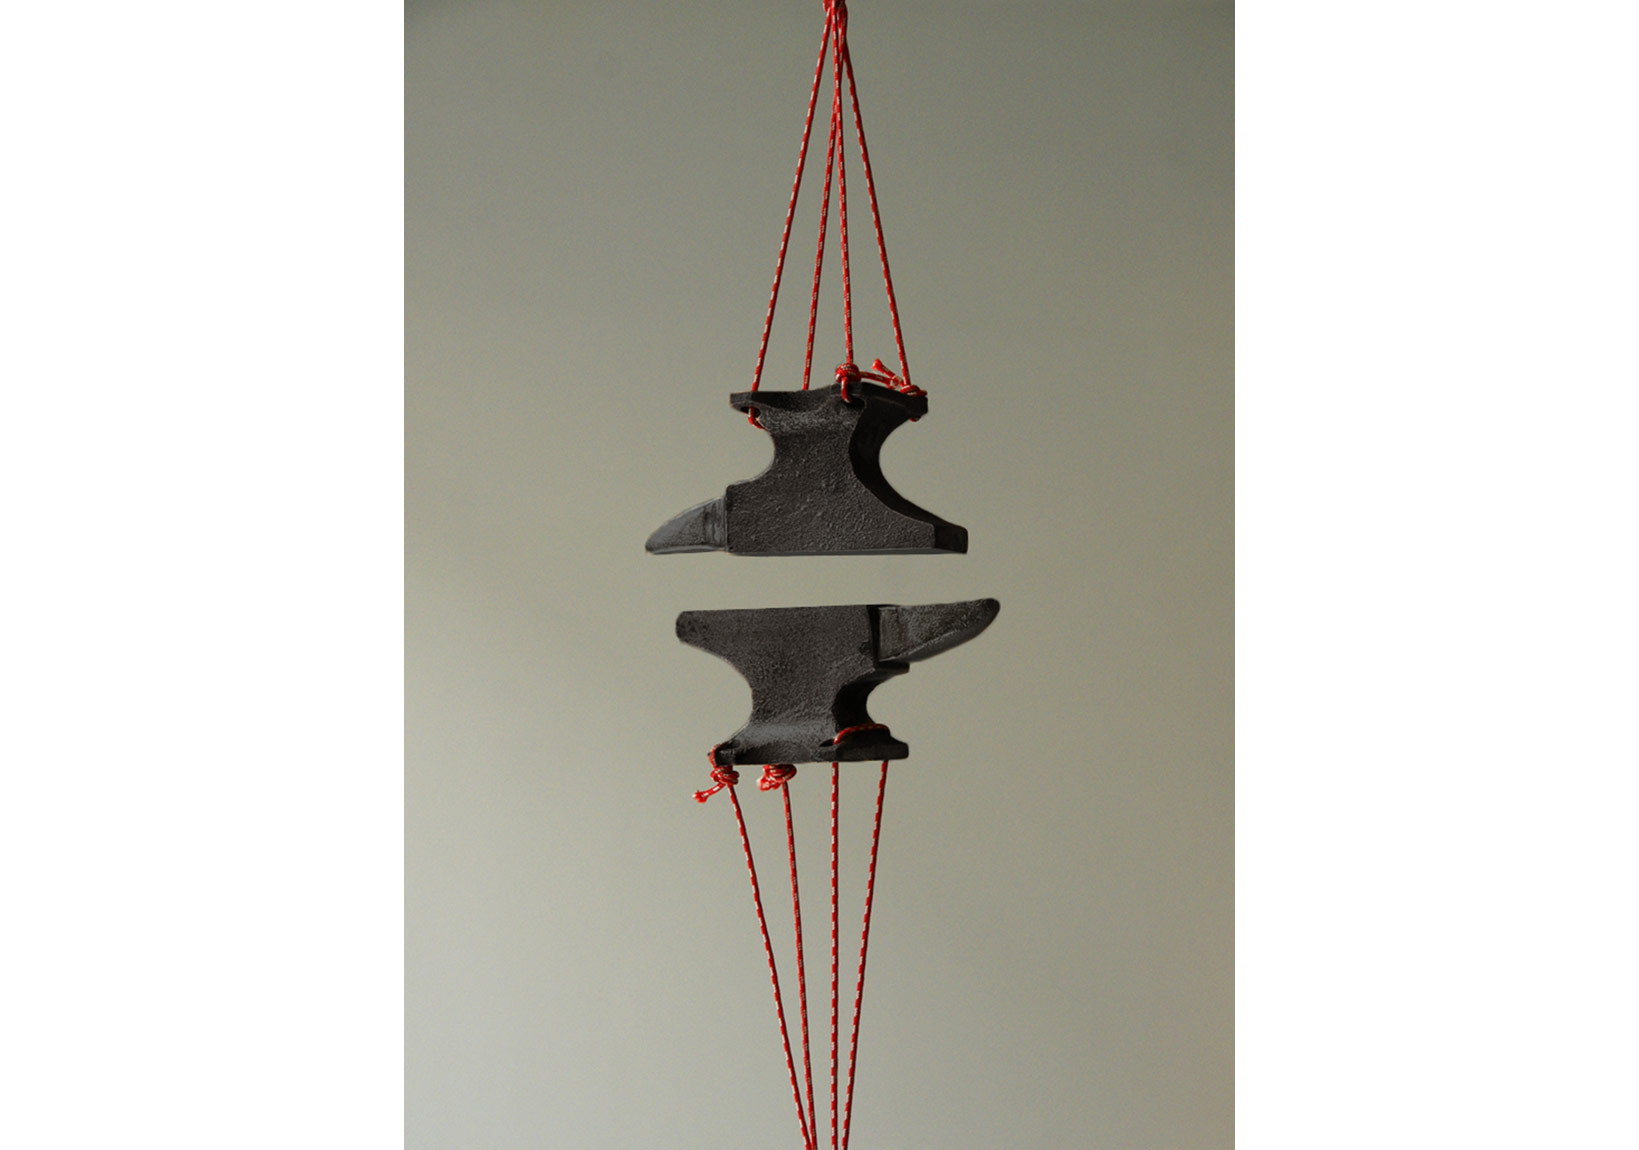 '14 millimetres', bronze, magnet, string, 2011.